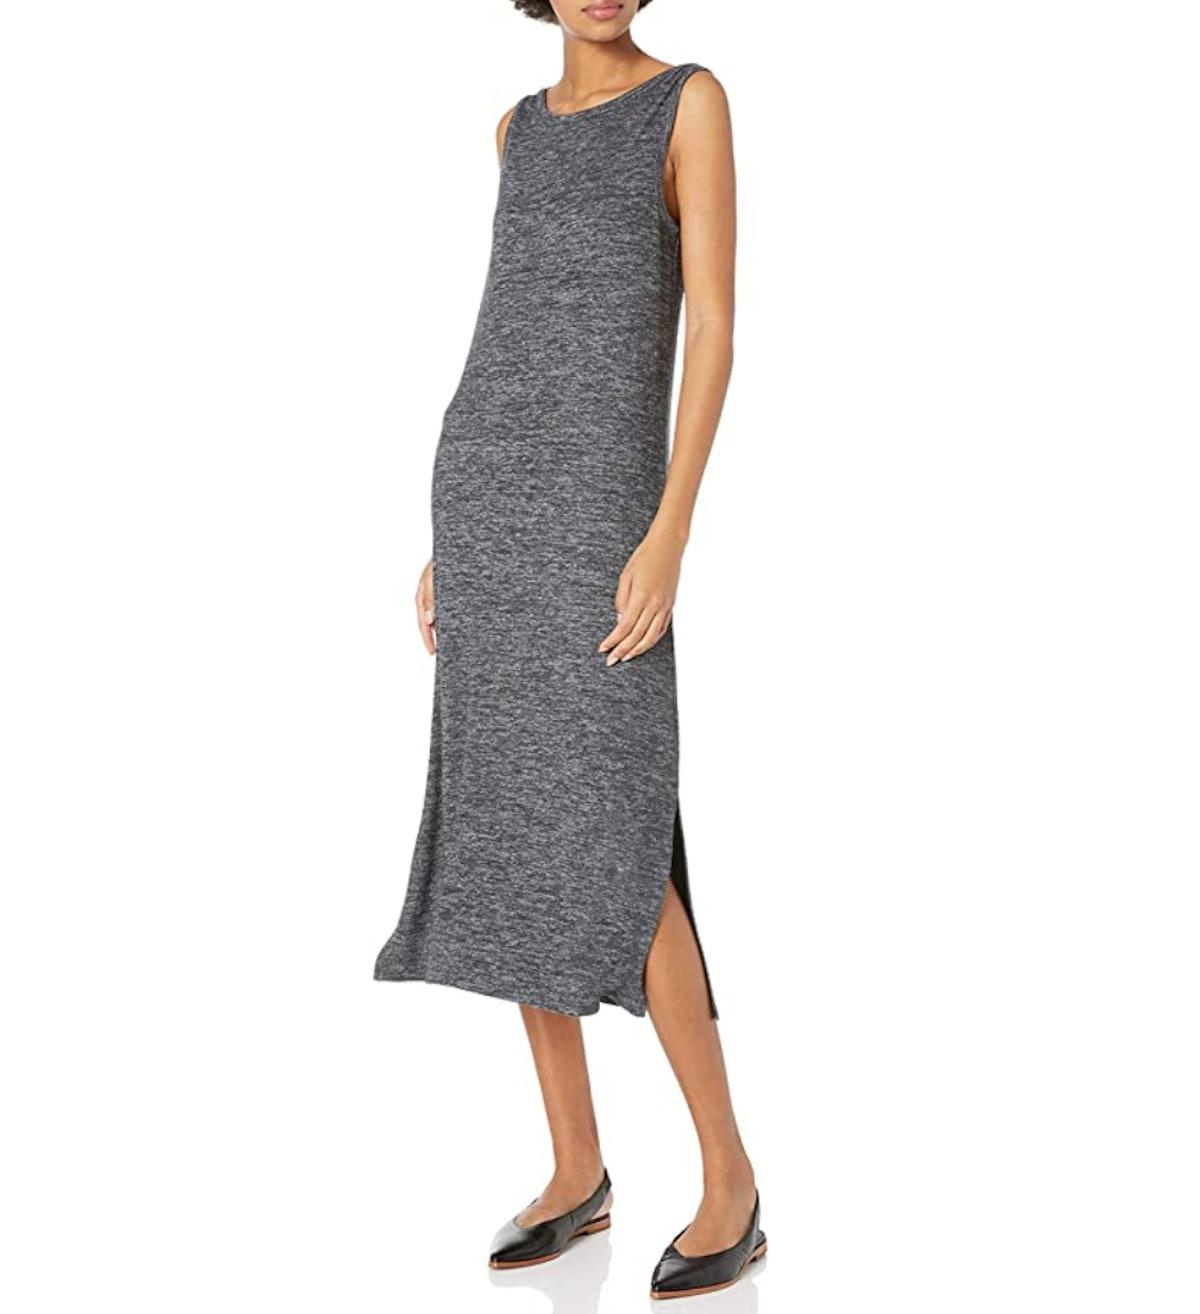 Daily Ritual Sleeveless Bateau Neck Midi Dress